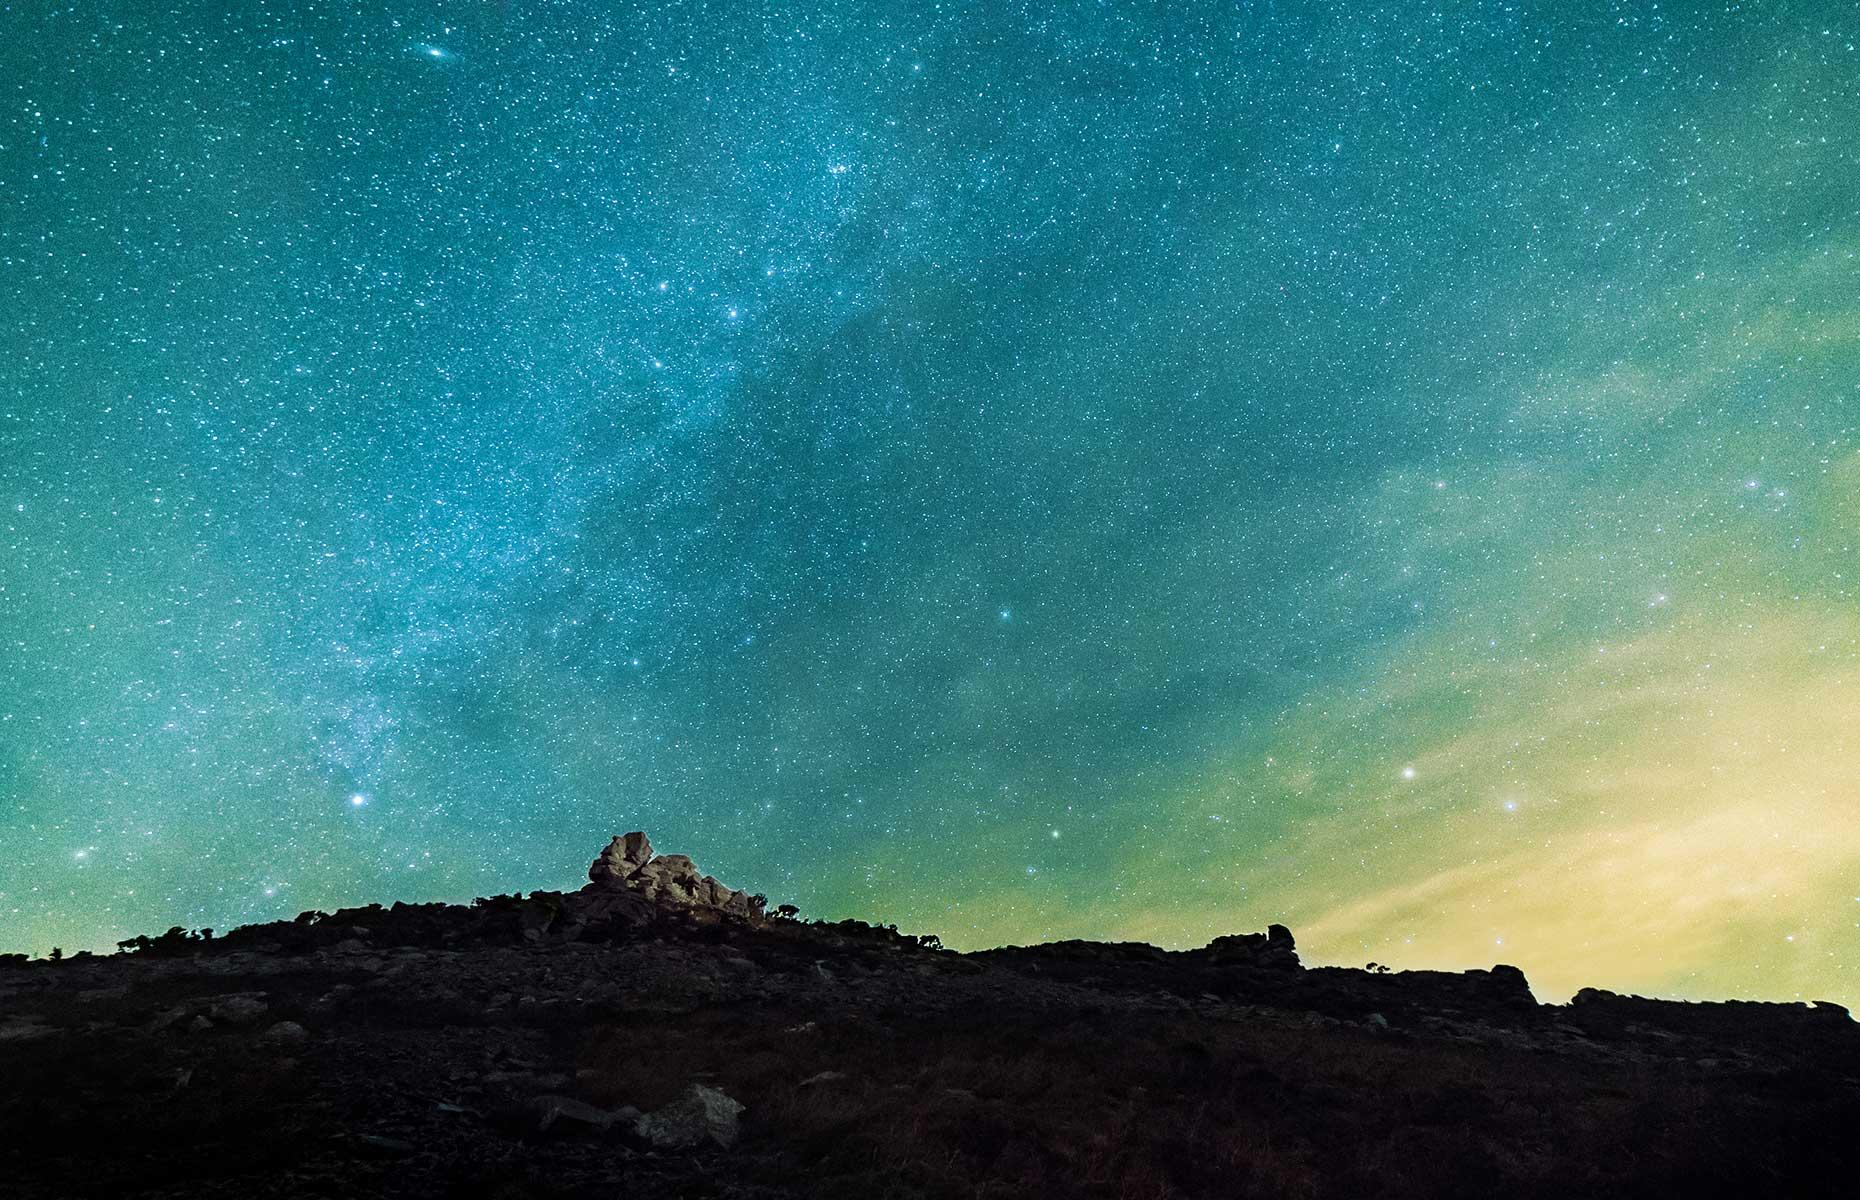 Exmoor National Park dark skies reserve (Arthur Cauty/Shutterstock)